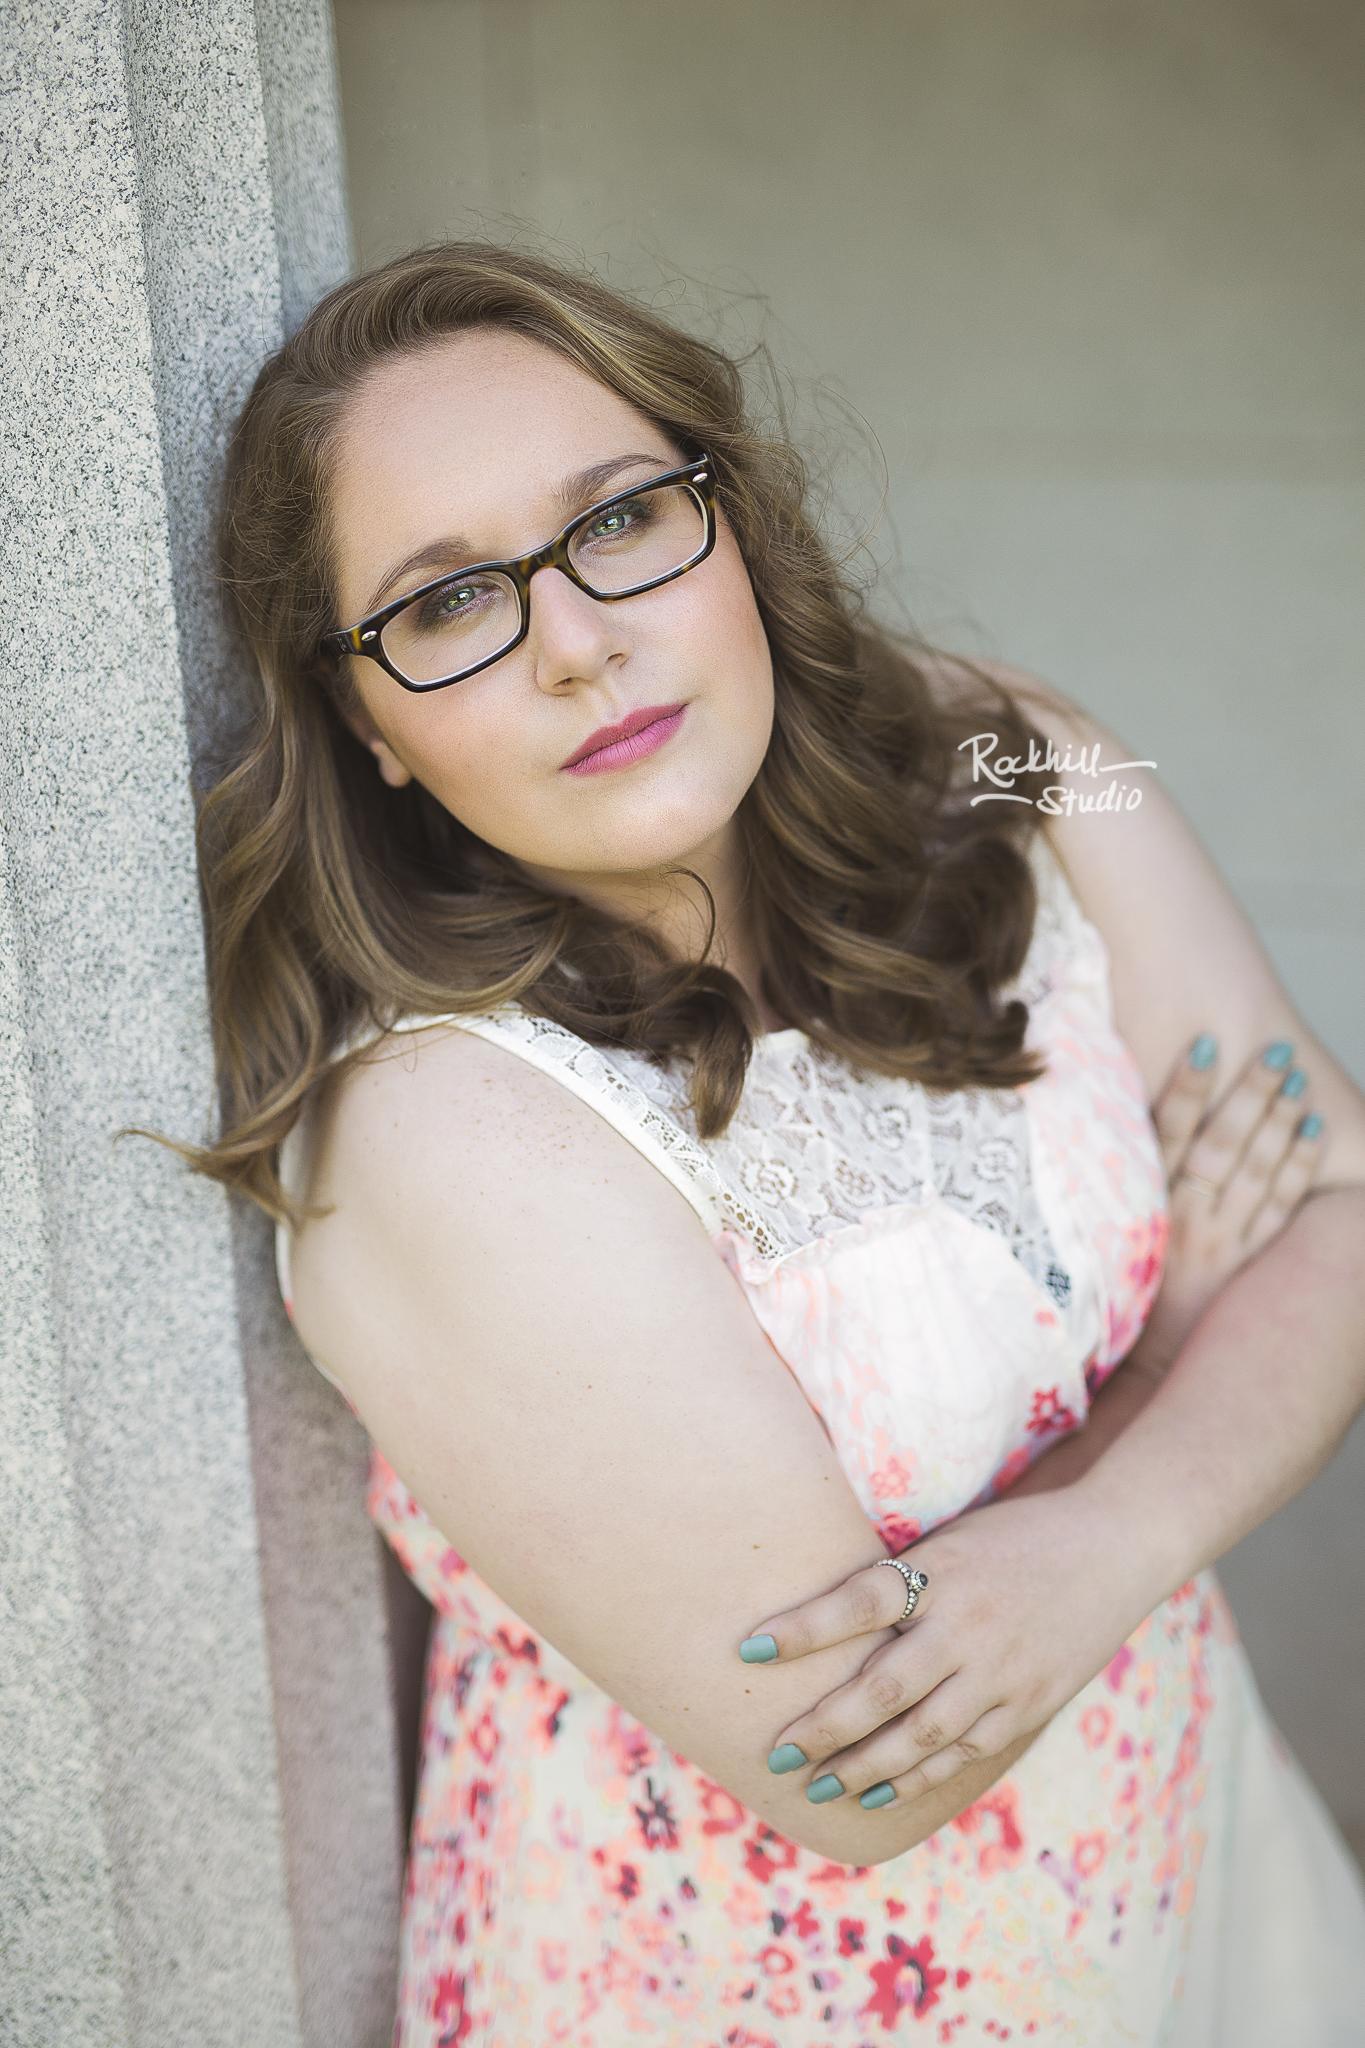 marquette-senior-photographer-upper-peninsula-michigan-girl-glasses.jpg